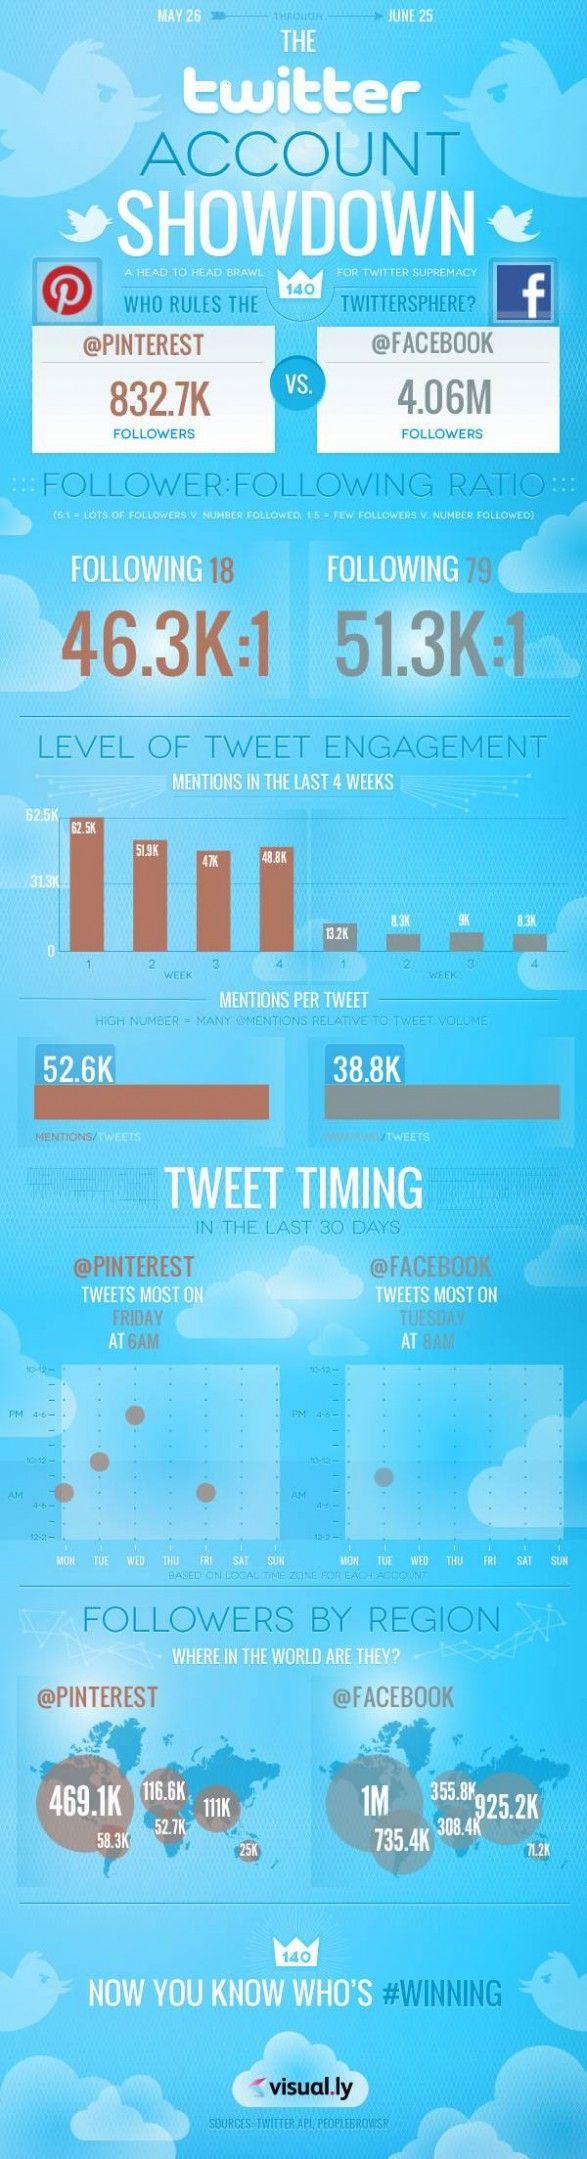 The #Twitter Account Showdown: #Pinterest vs #Facebook